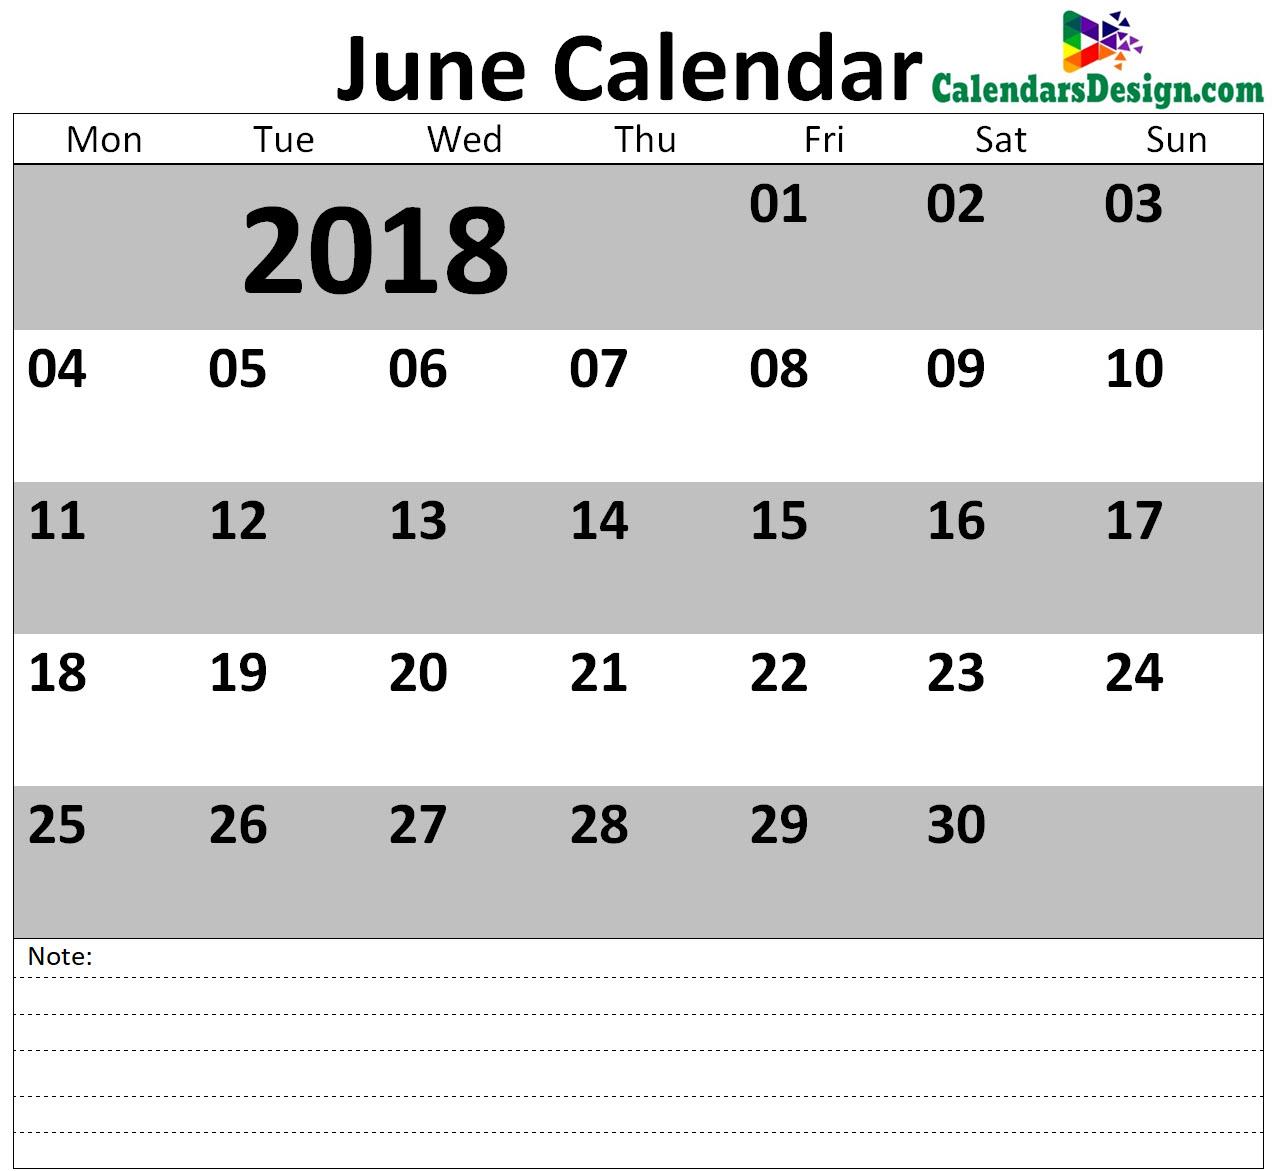 June 2018 Calendar Blank Template